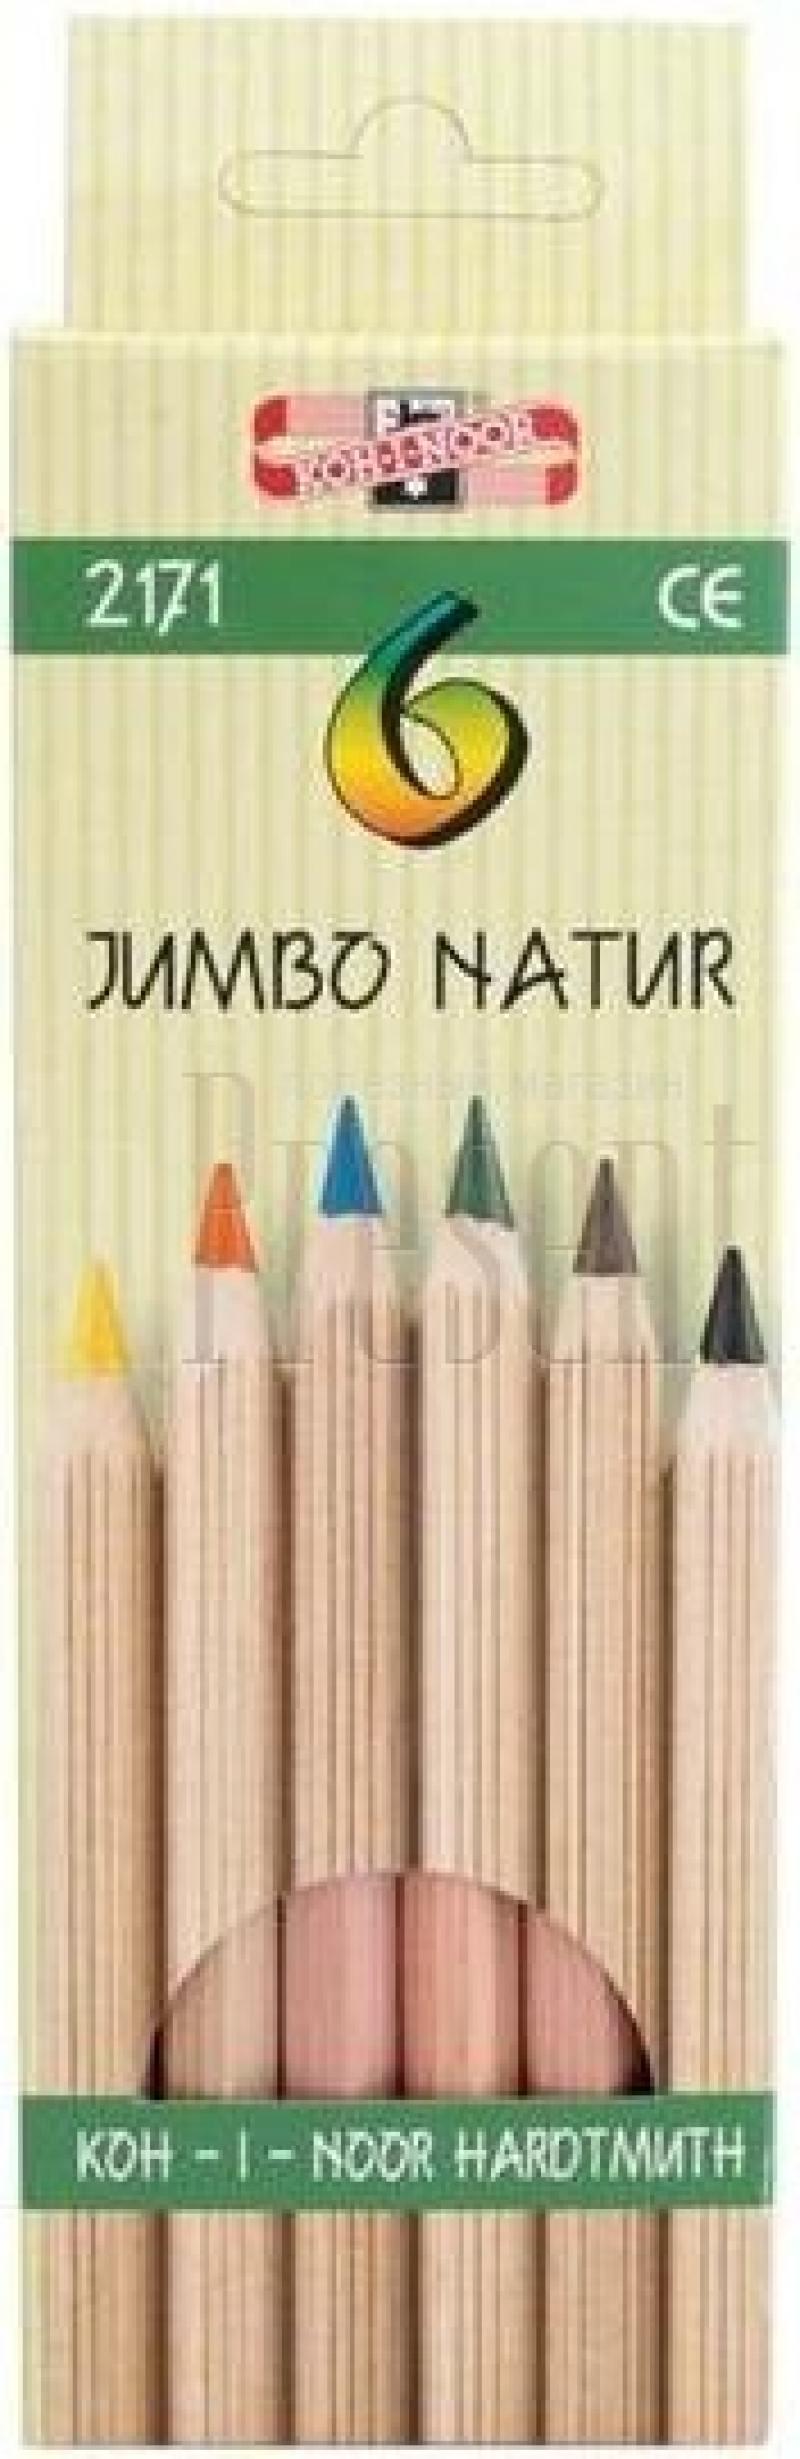 Набор цветных карандашей Koh-i-Noor JUMBO NATUR 6 шт 2171N/6 2171N/6 набор свечей тигренок с подсолнухом 9х6 см 6 шт